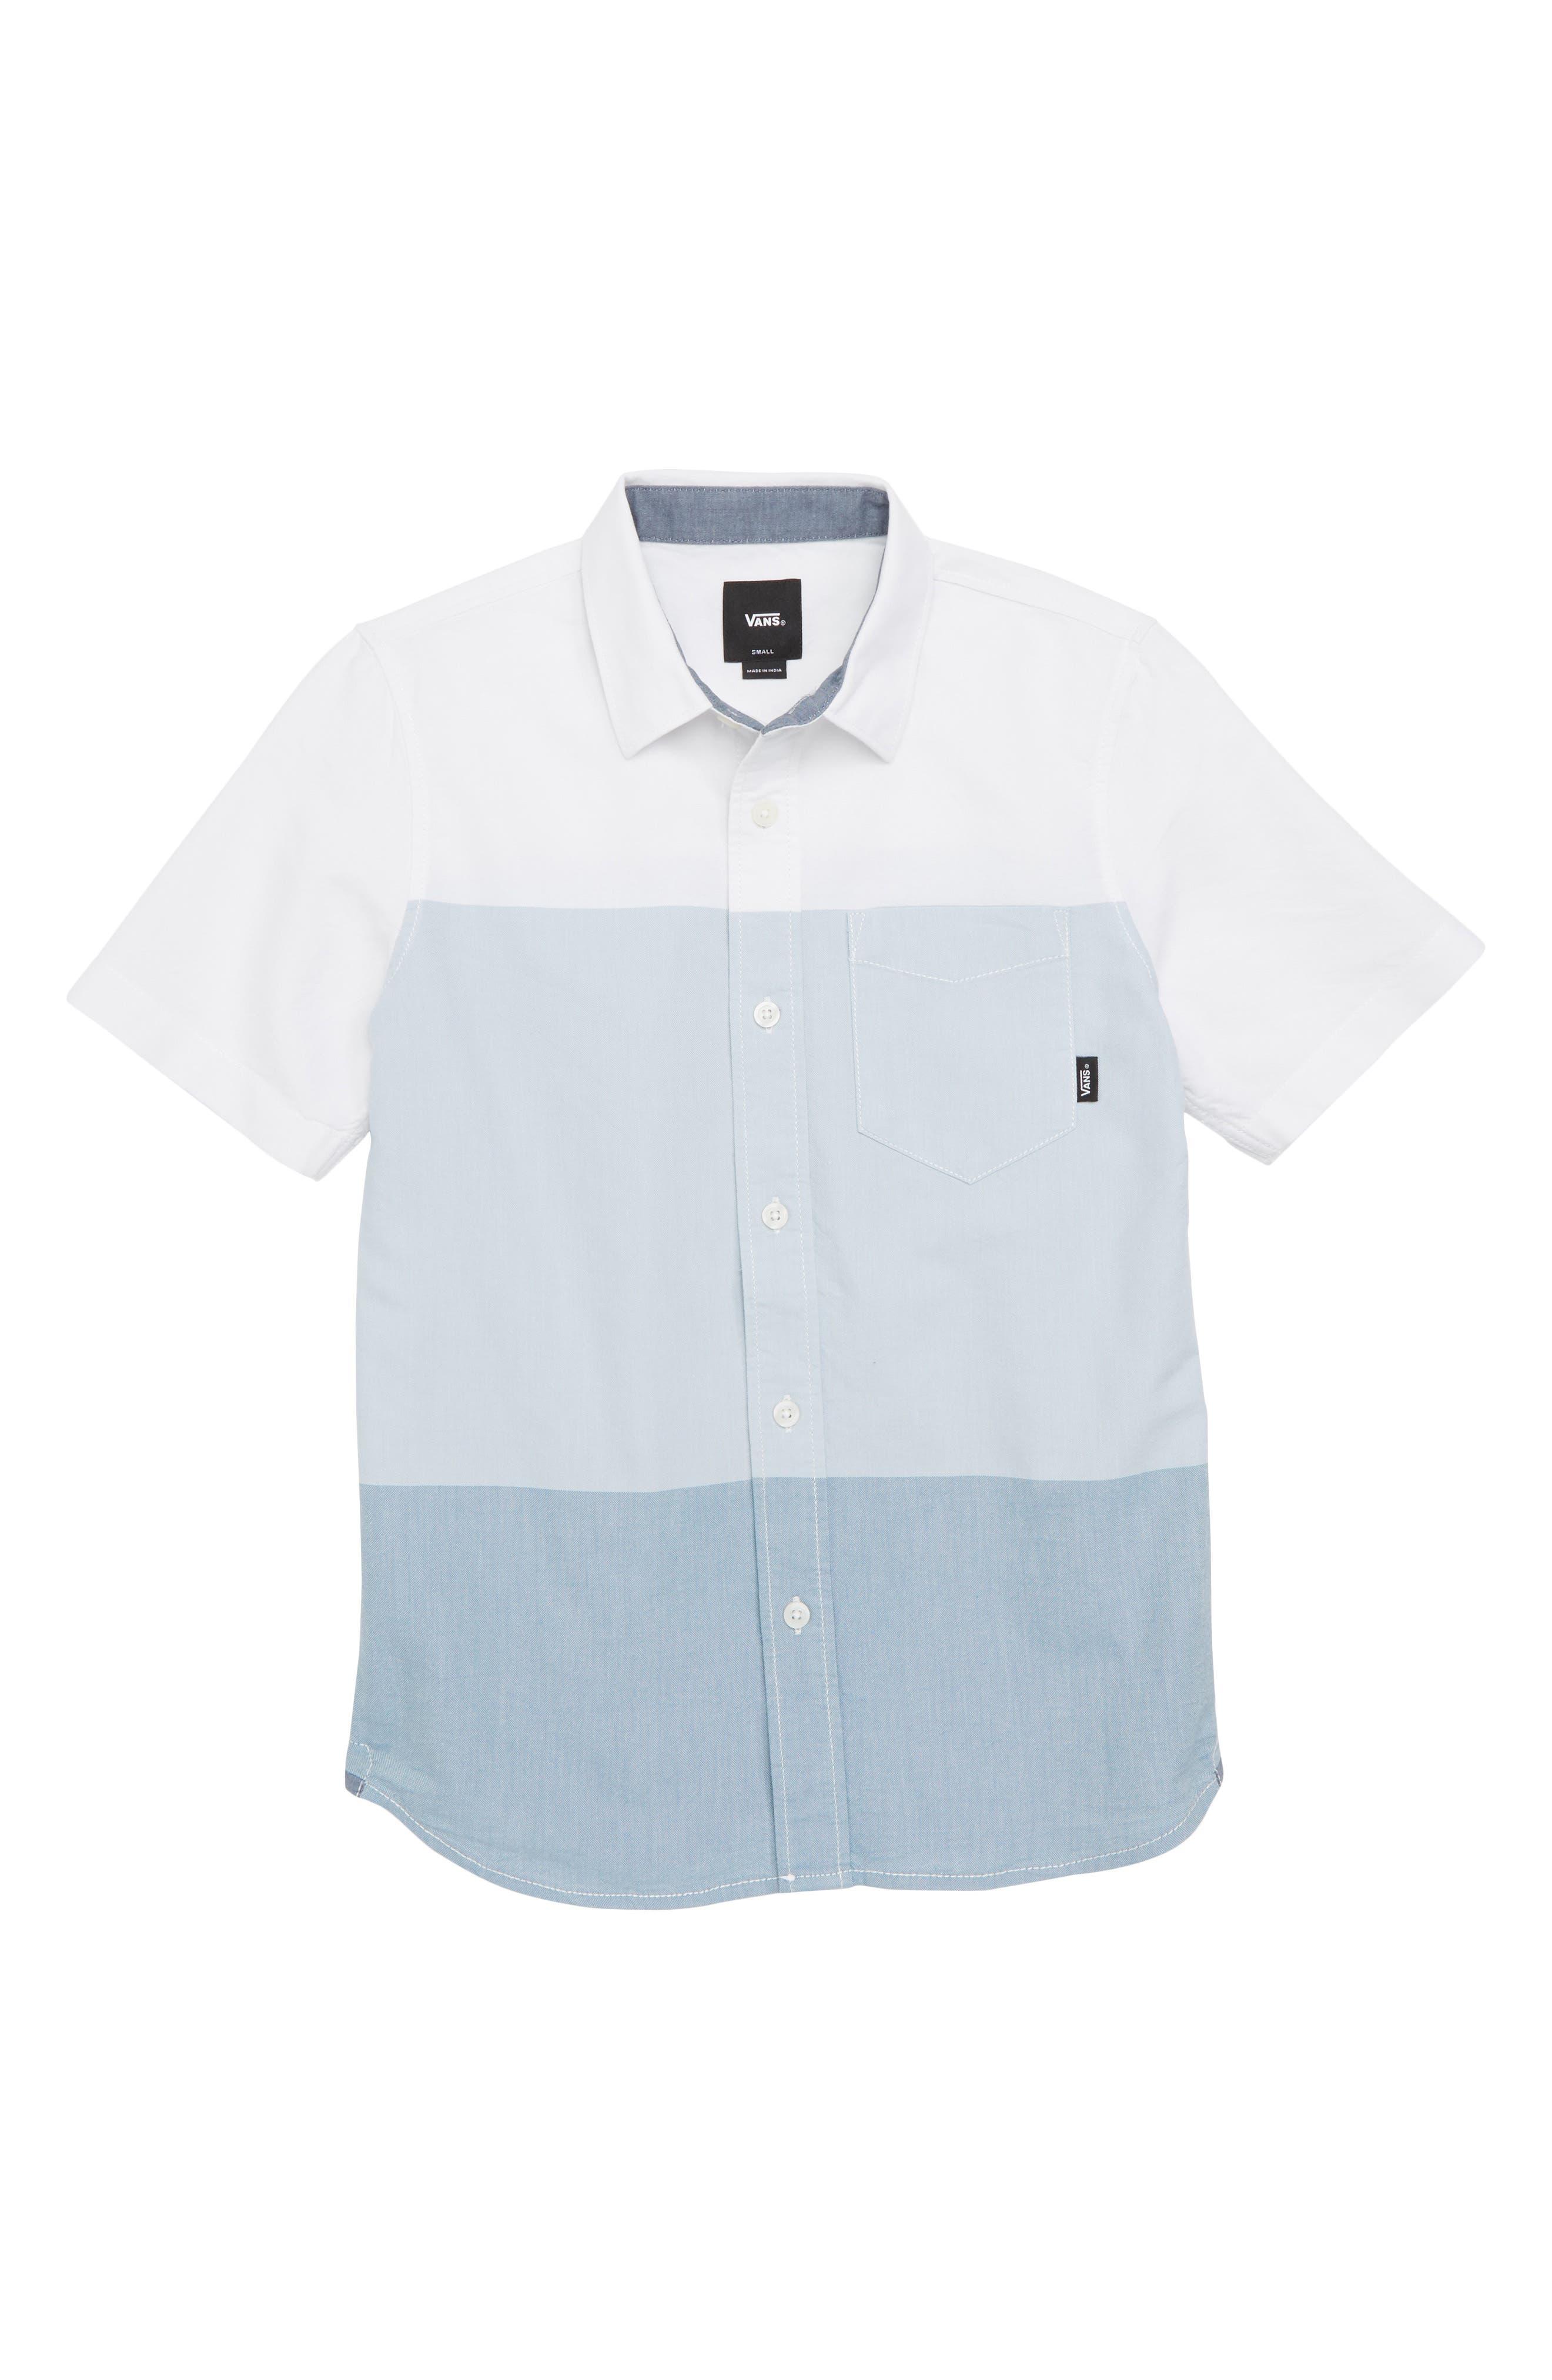 Houser Woven Shirt,                             Main thumbnail 1, color,                             White/ Real Teal